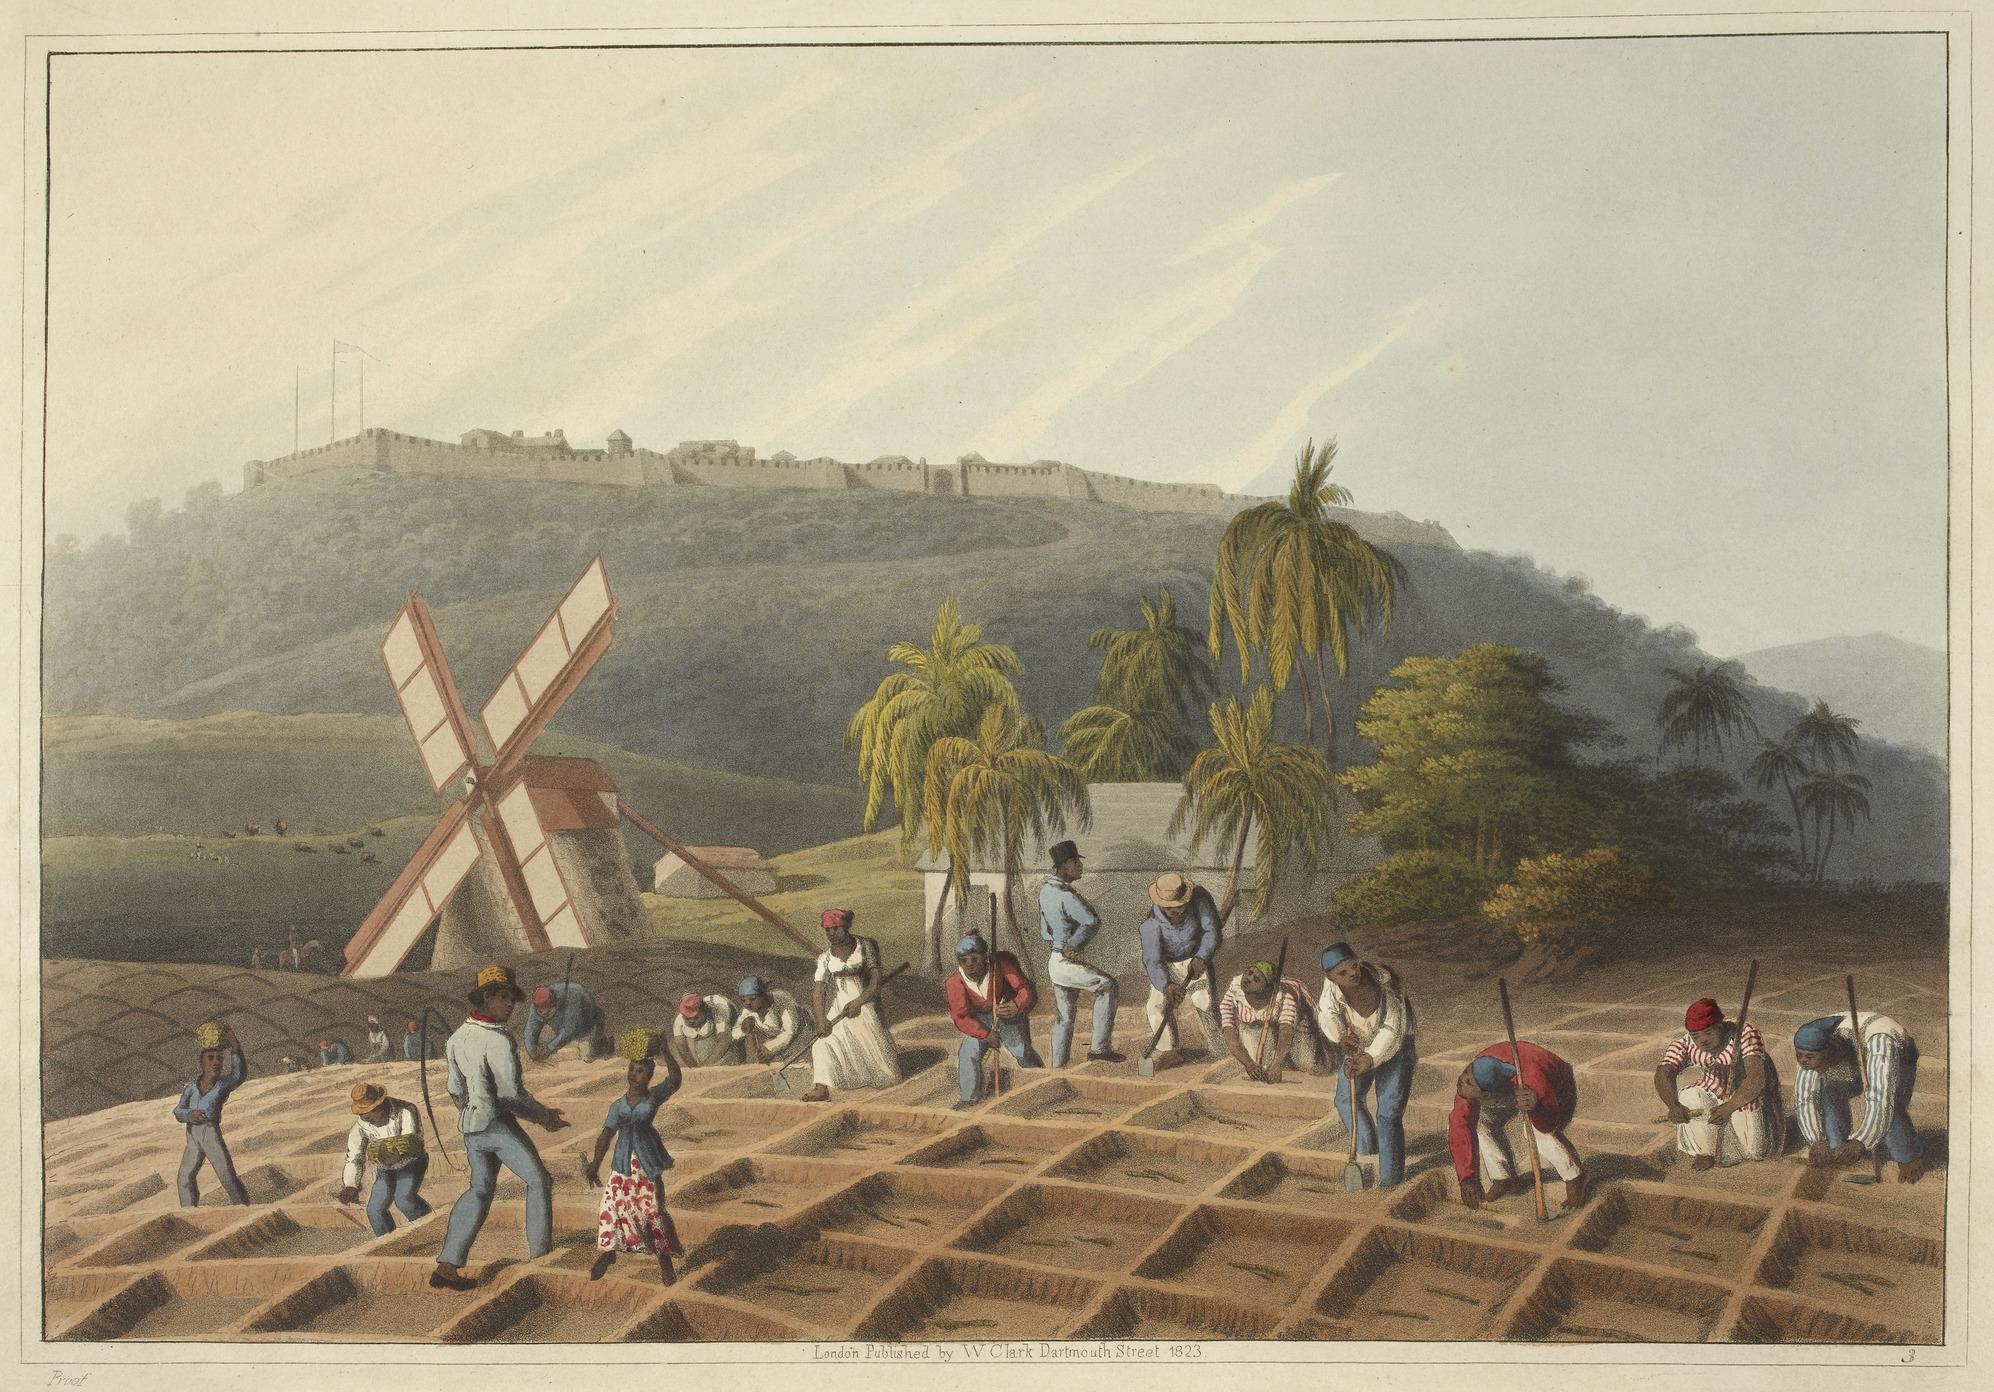 Sugar plantations